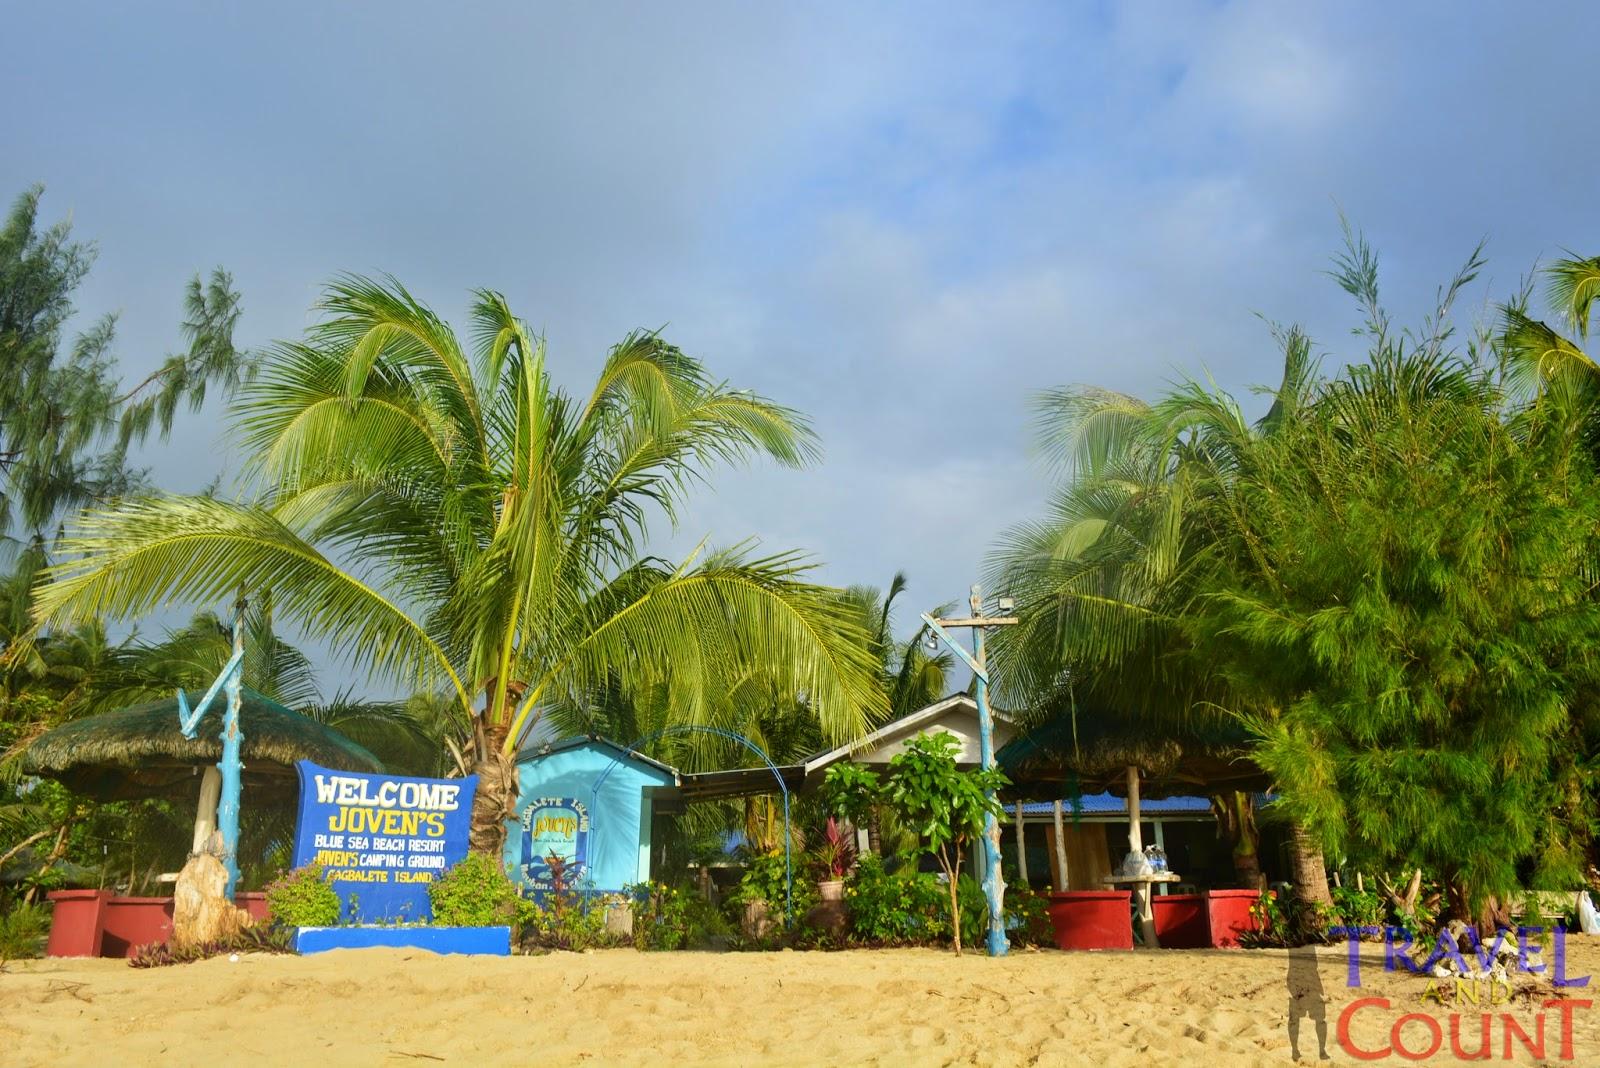 Joven's Blue Sea Beach Resort, Cagbalete Island